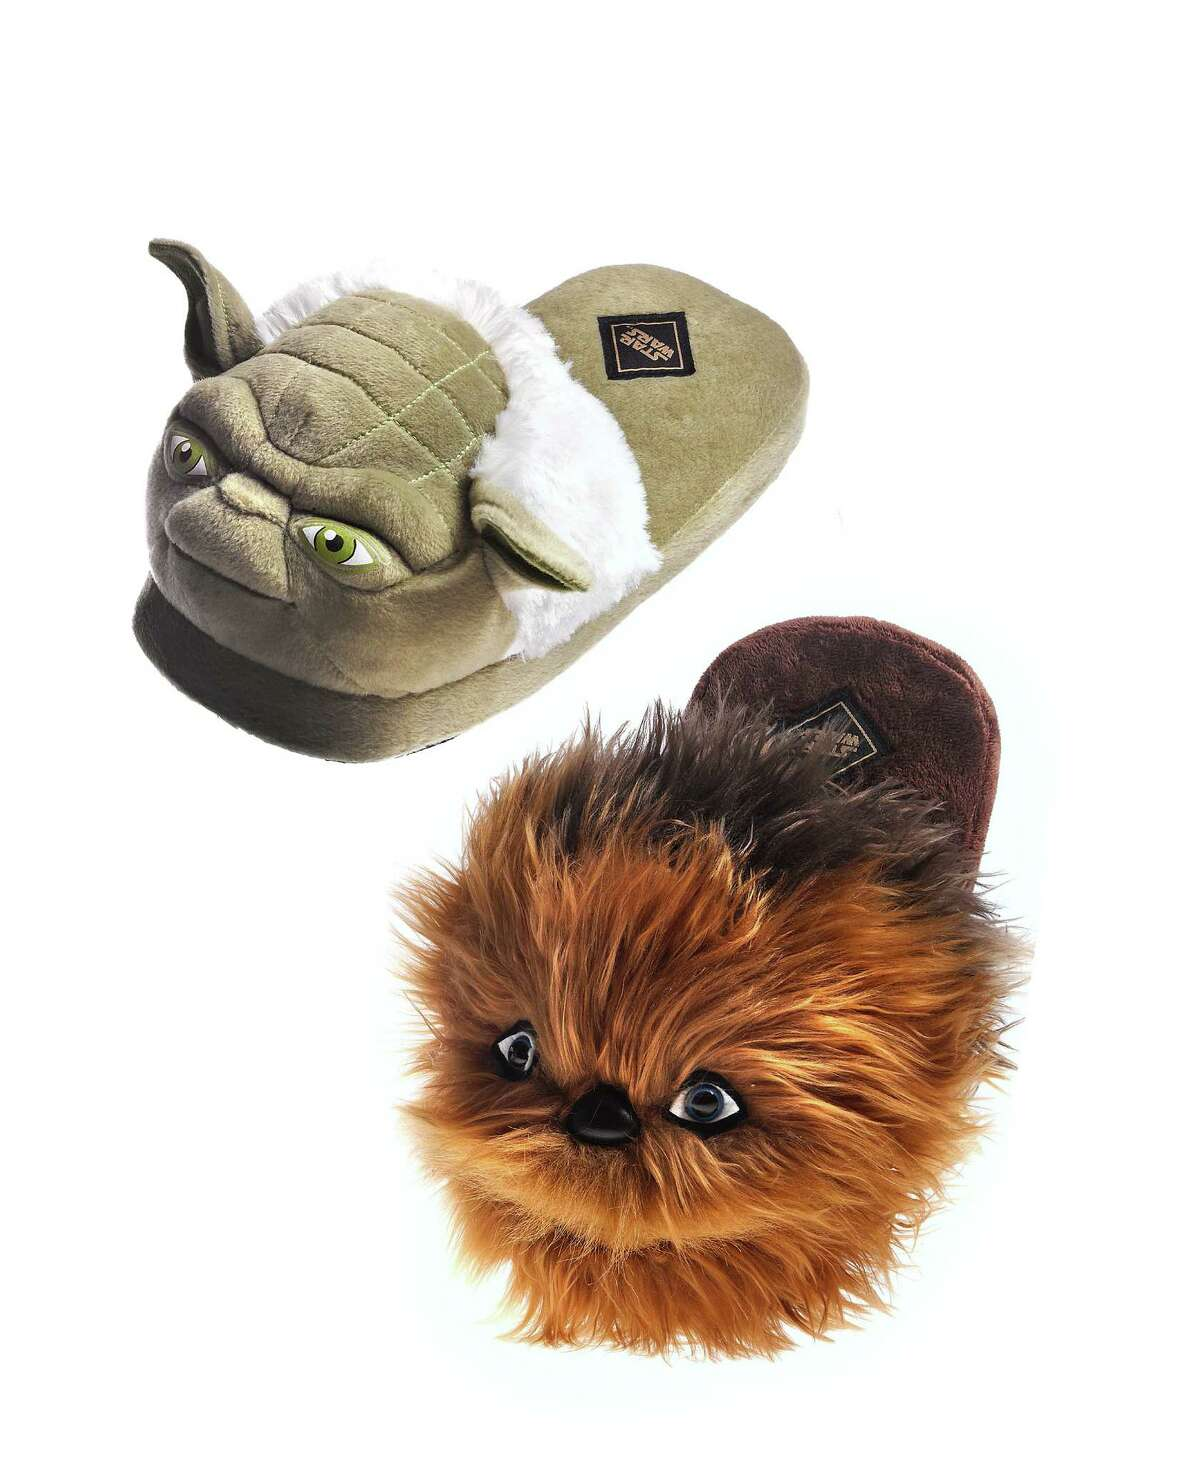 Bioworld 'Star Wars' Yoda and Chewbacca Slippers: $29.99 at Macy's.com.